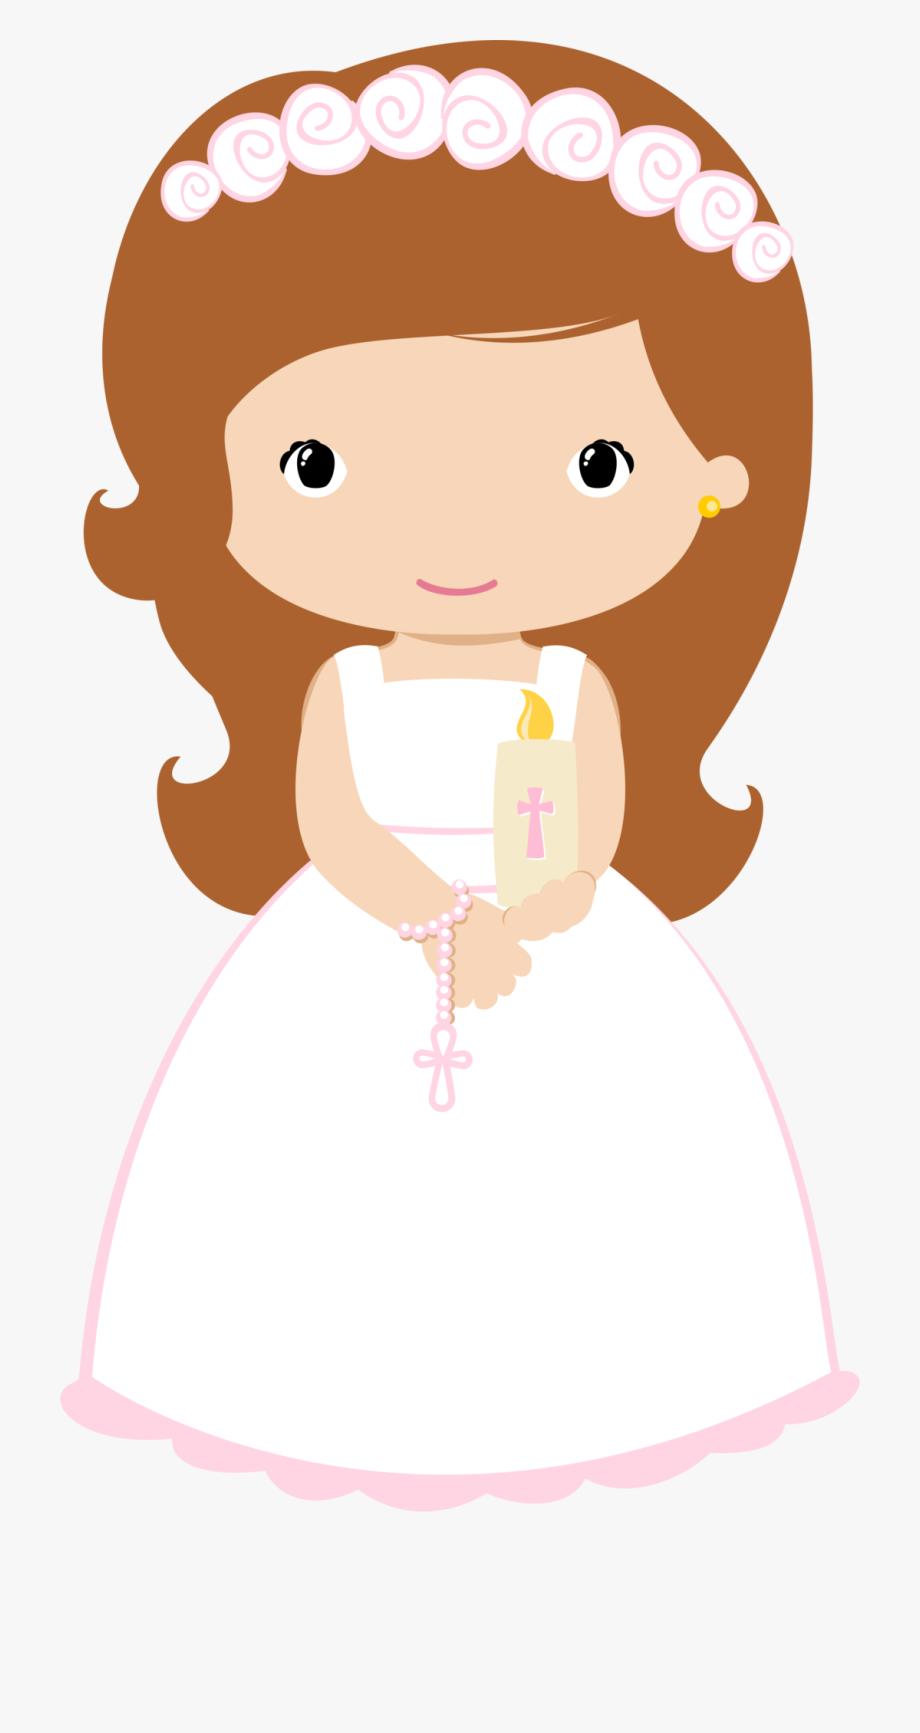 shared girl png. Communion clipart cartoon